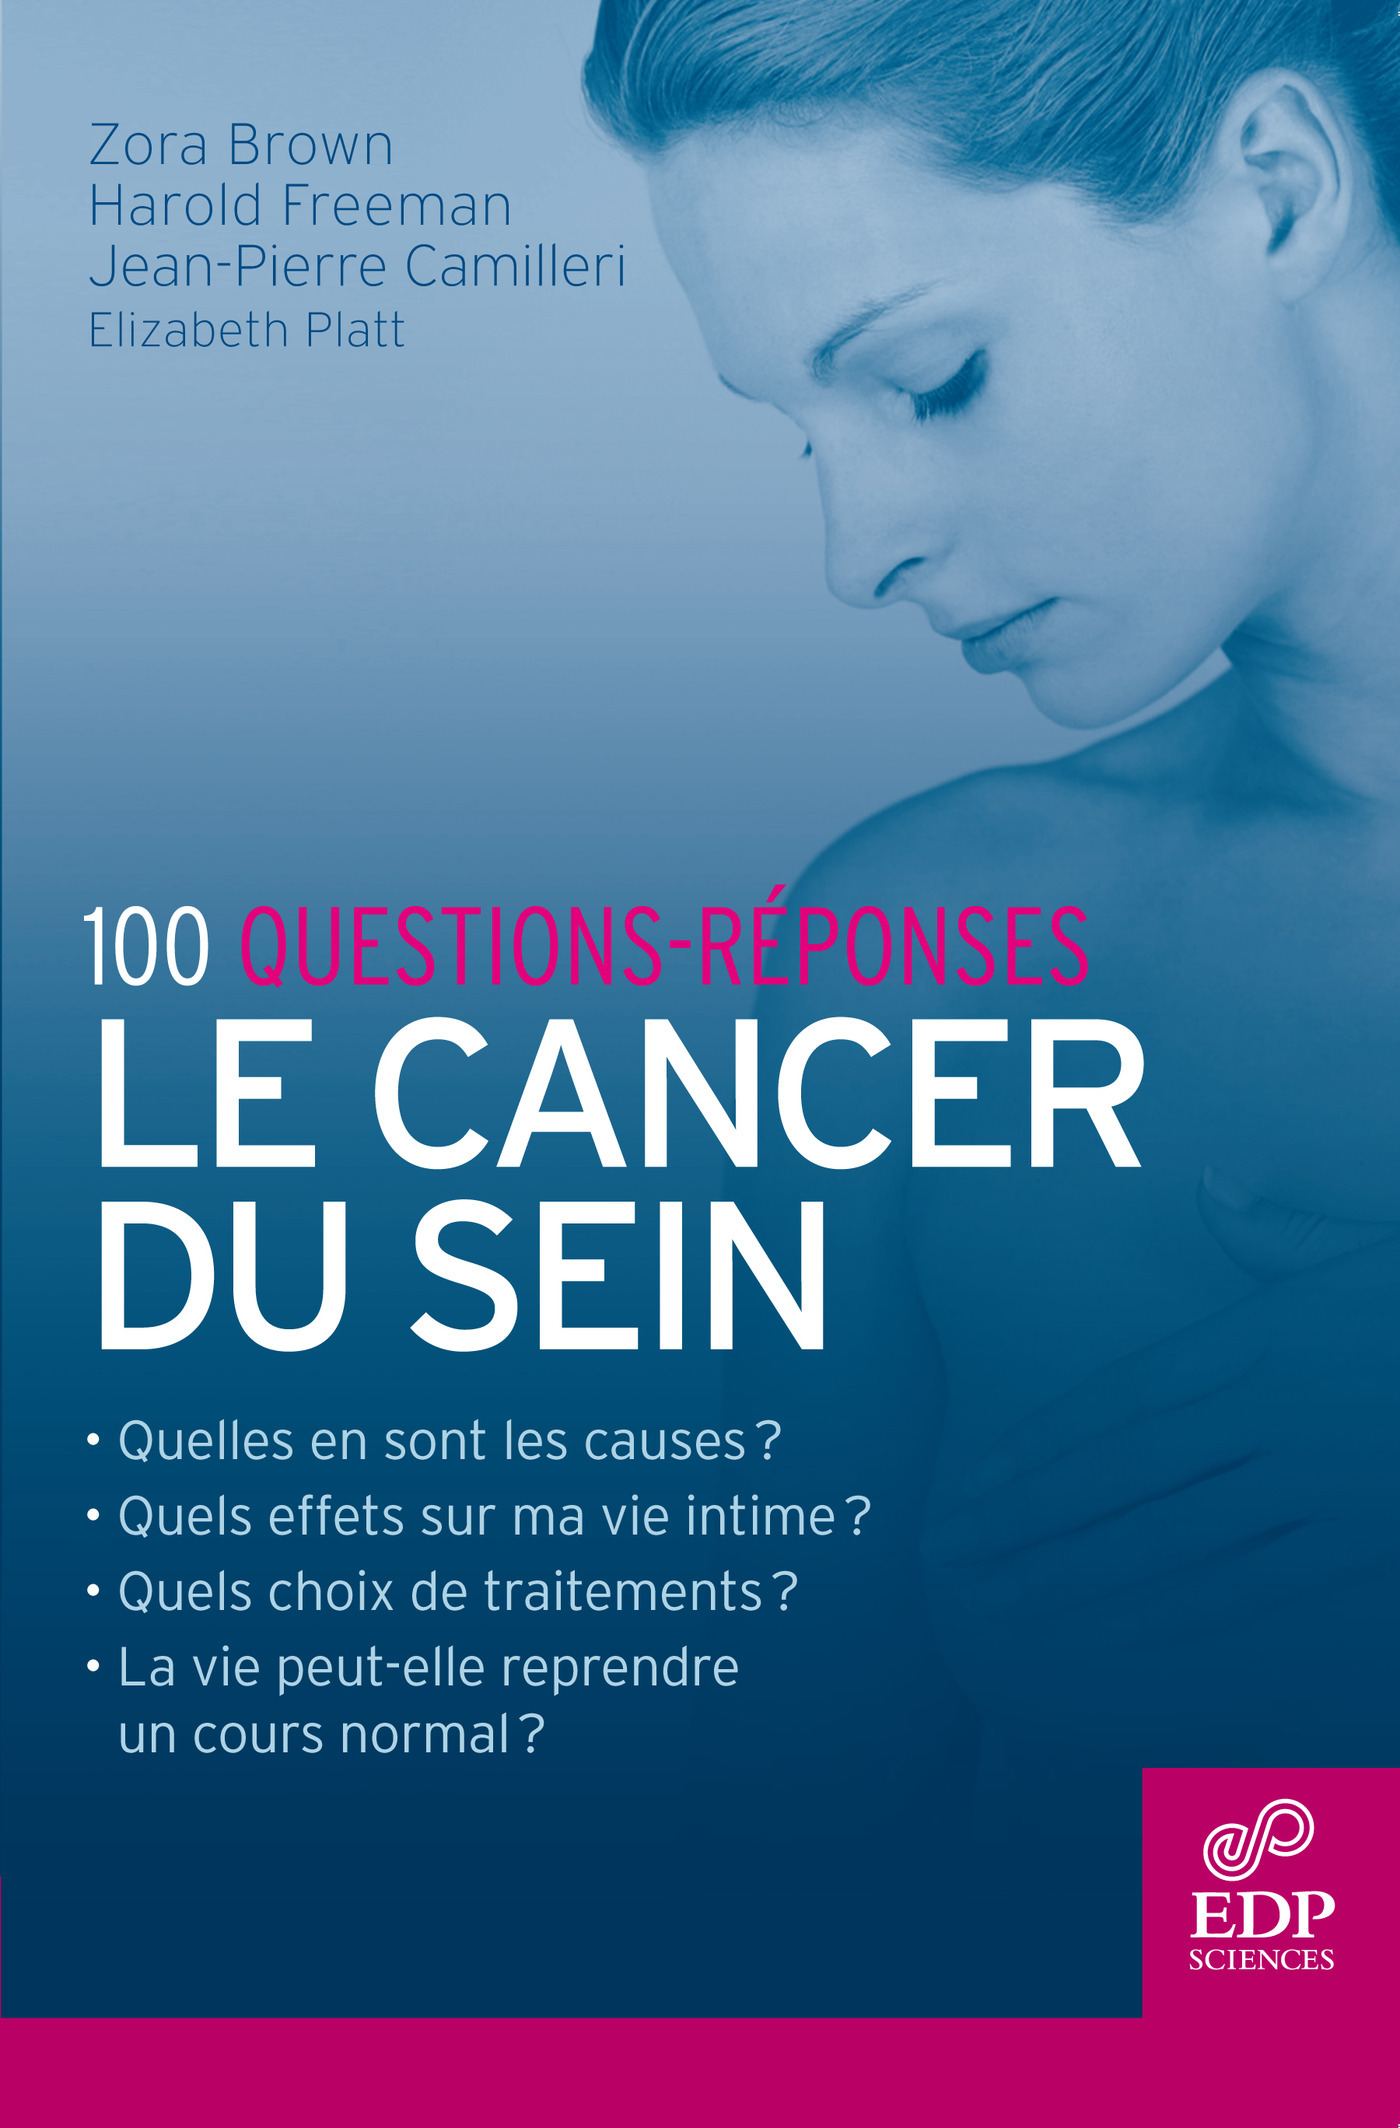 CANCER DU SEIN (LE)